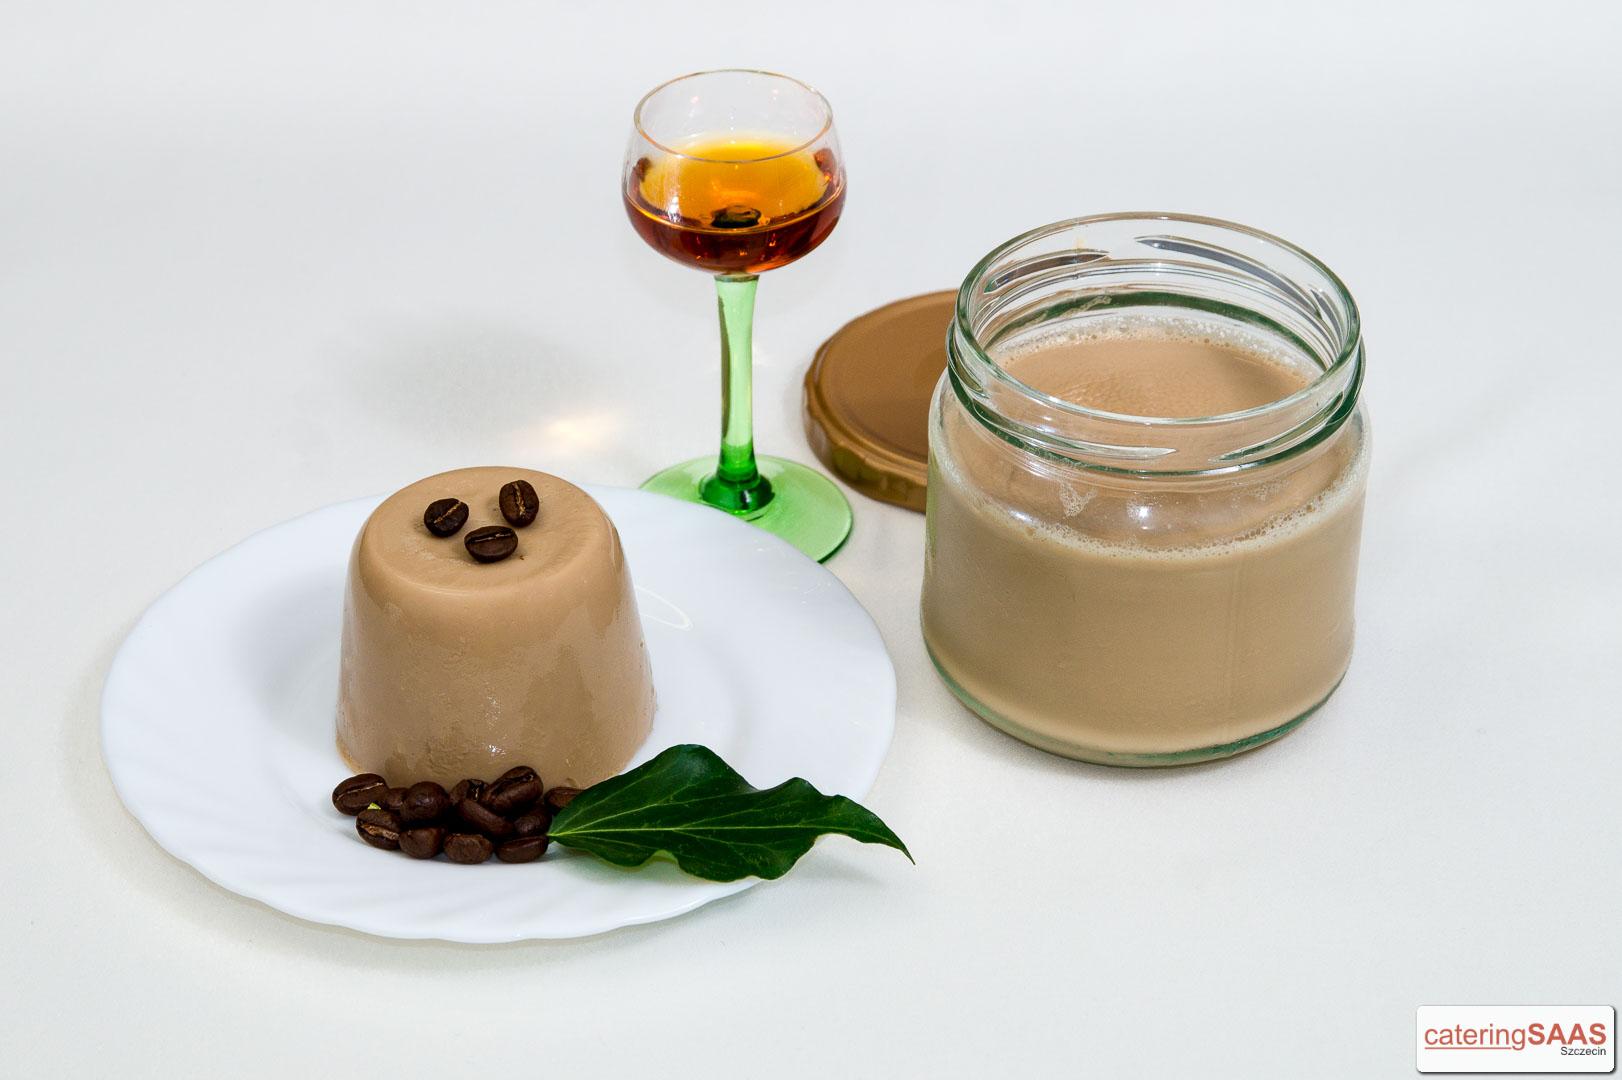 Saas kawa z amaretto